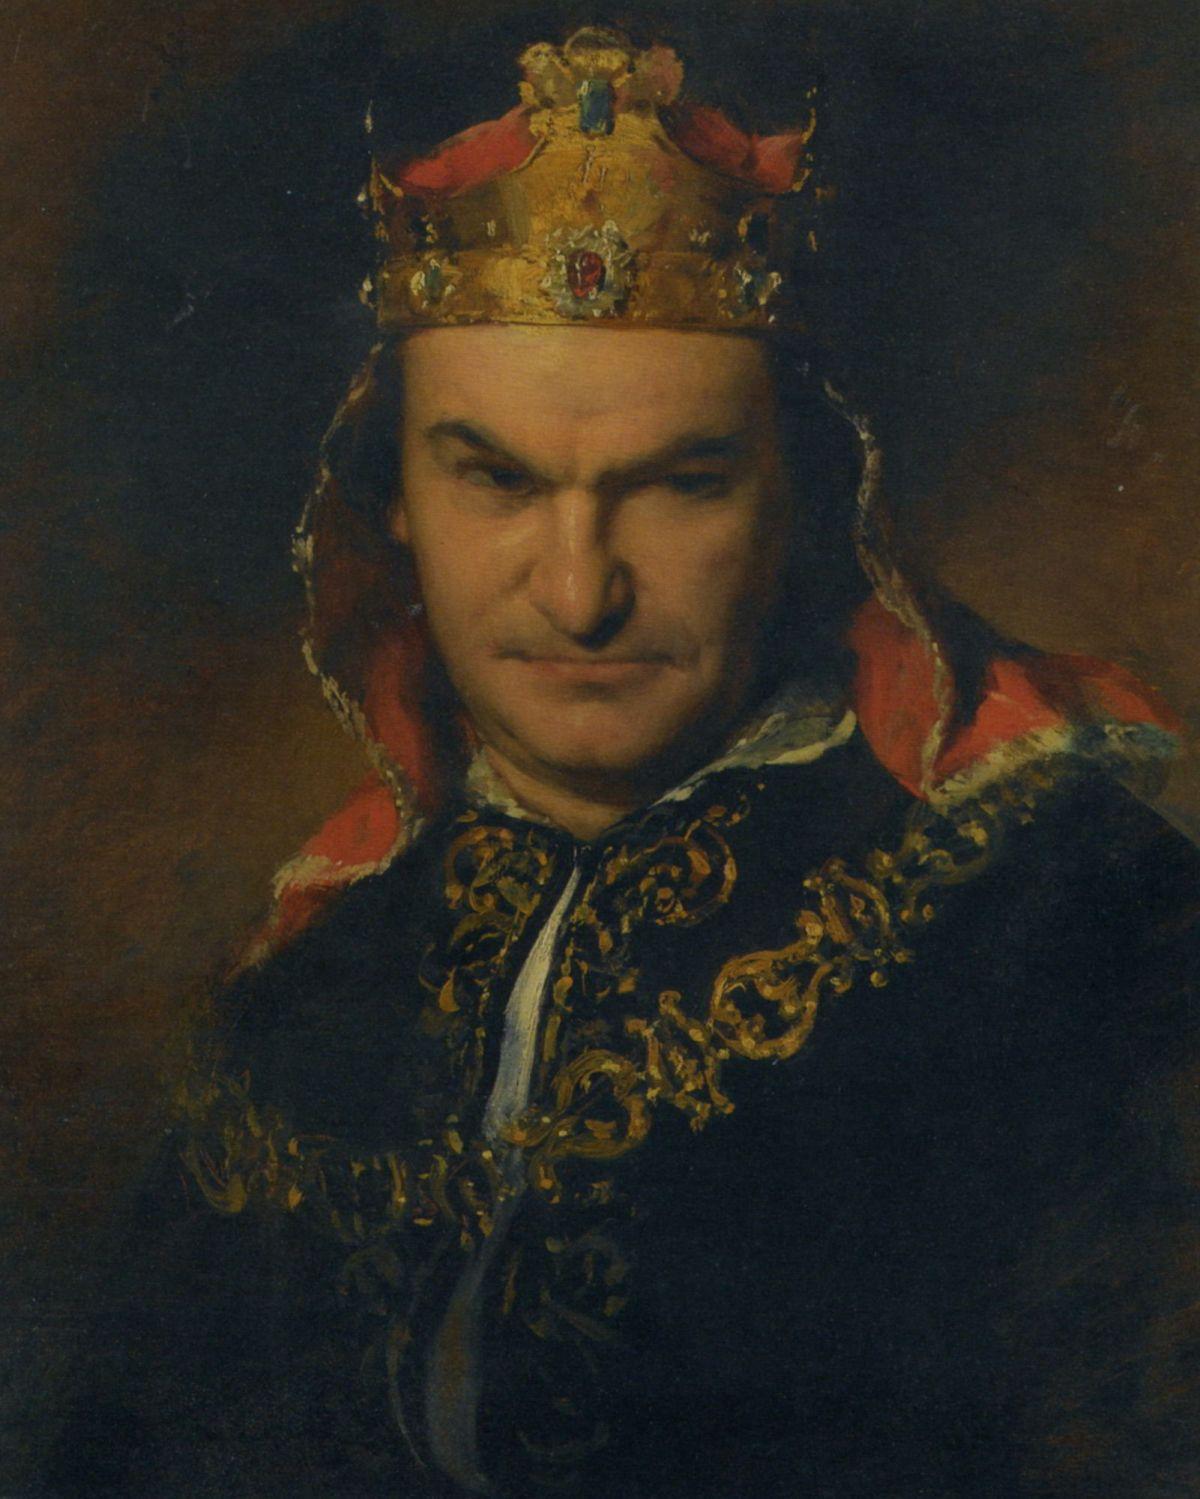 Portrait of the actor Bogumil Dawson as Richard III by Friedrich von Amerling